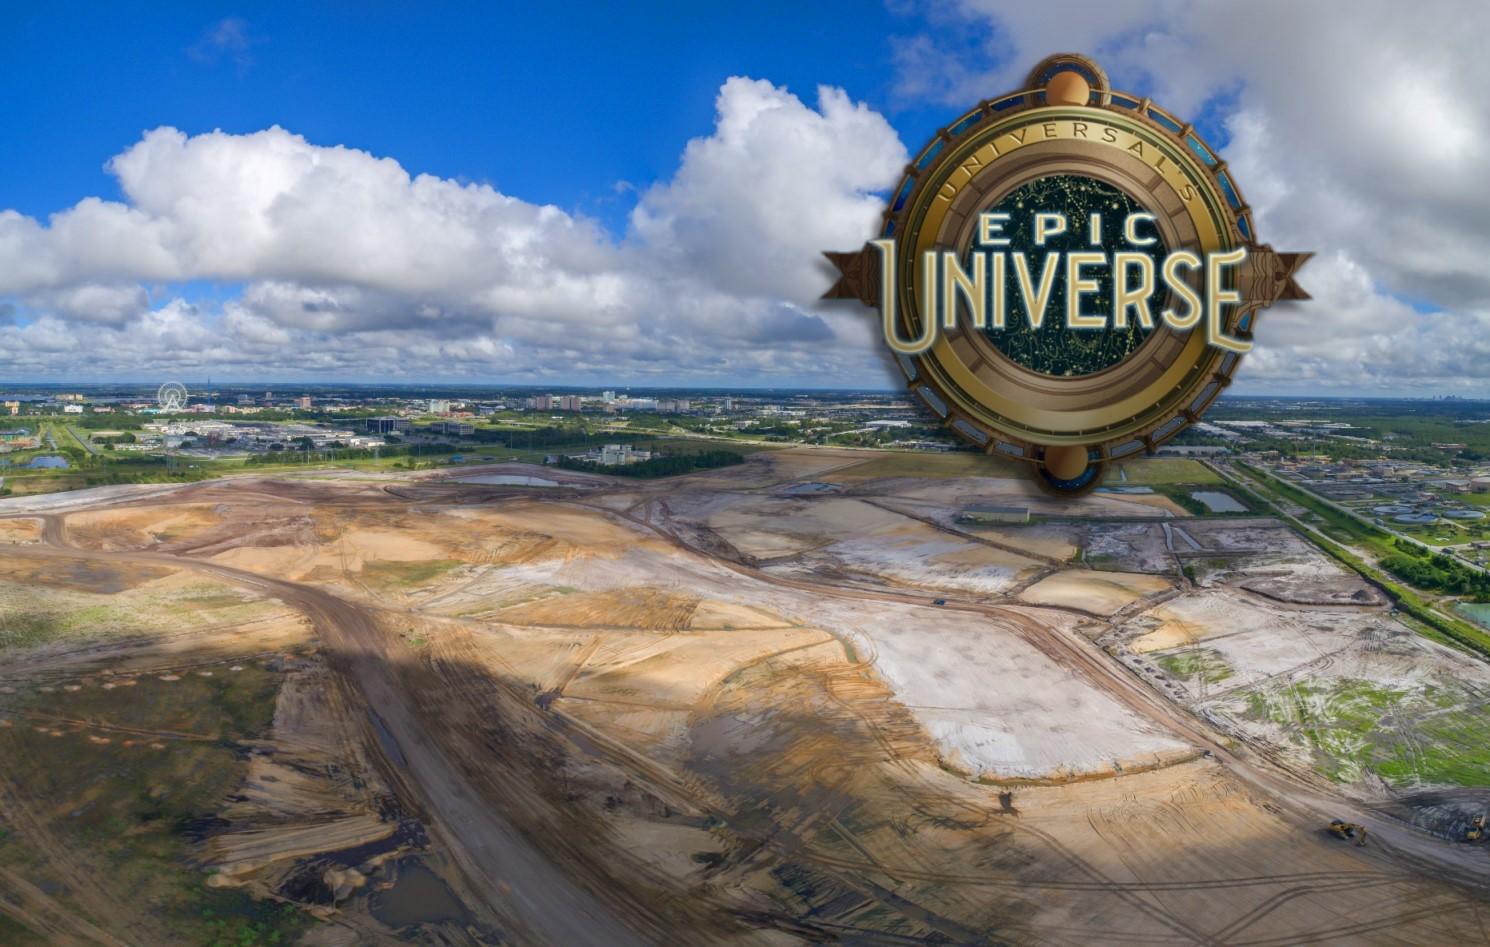 02-Epic-Universe-orlando